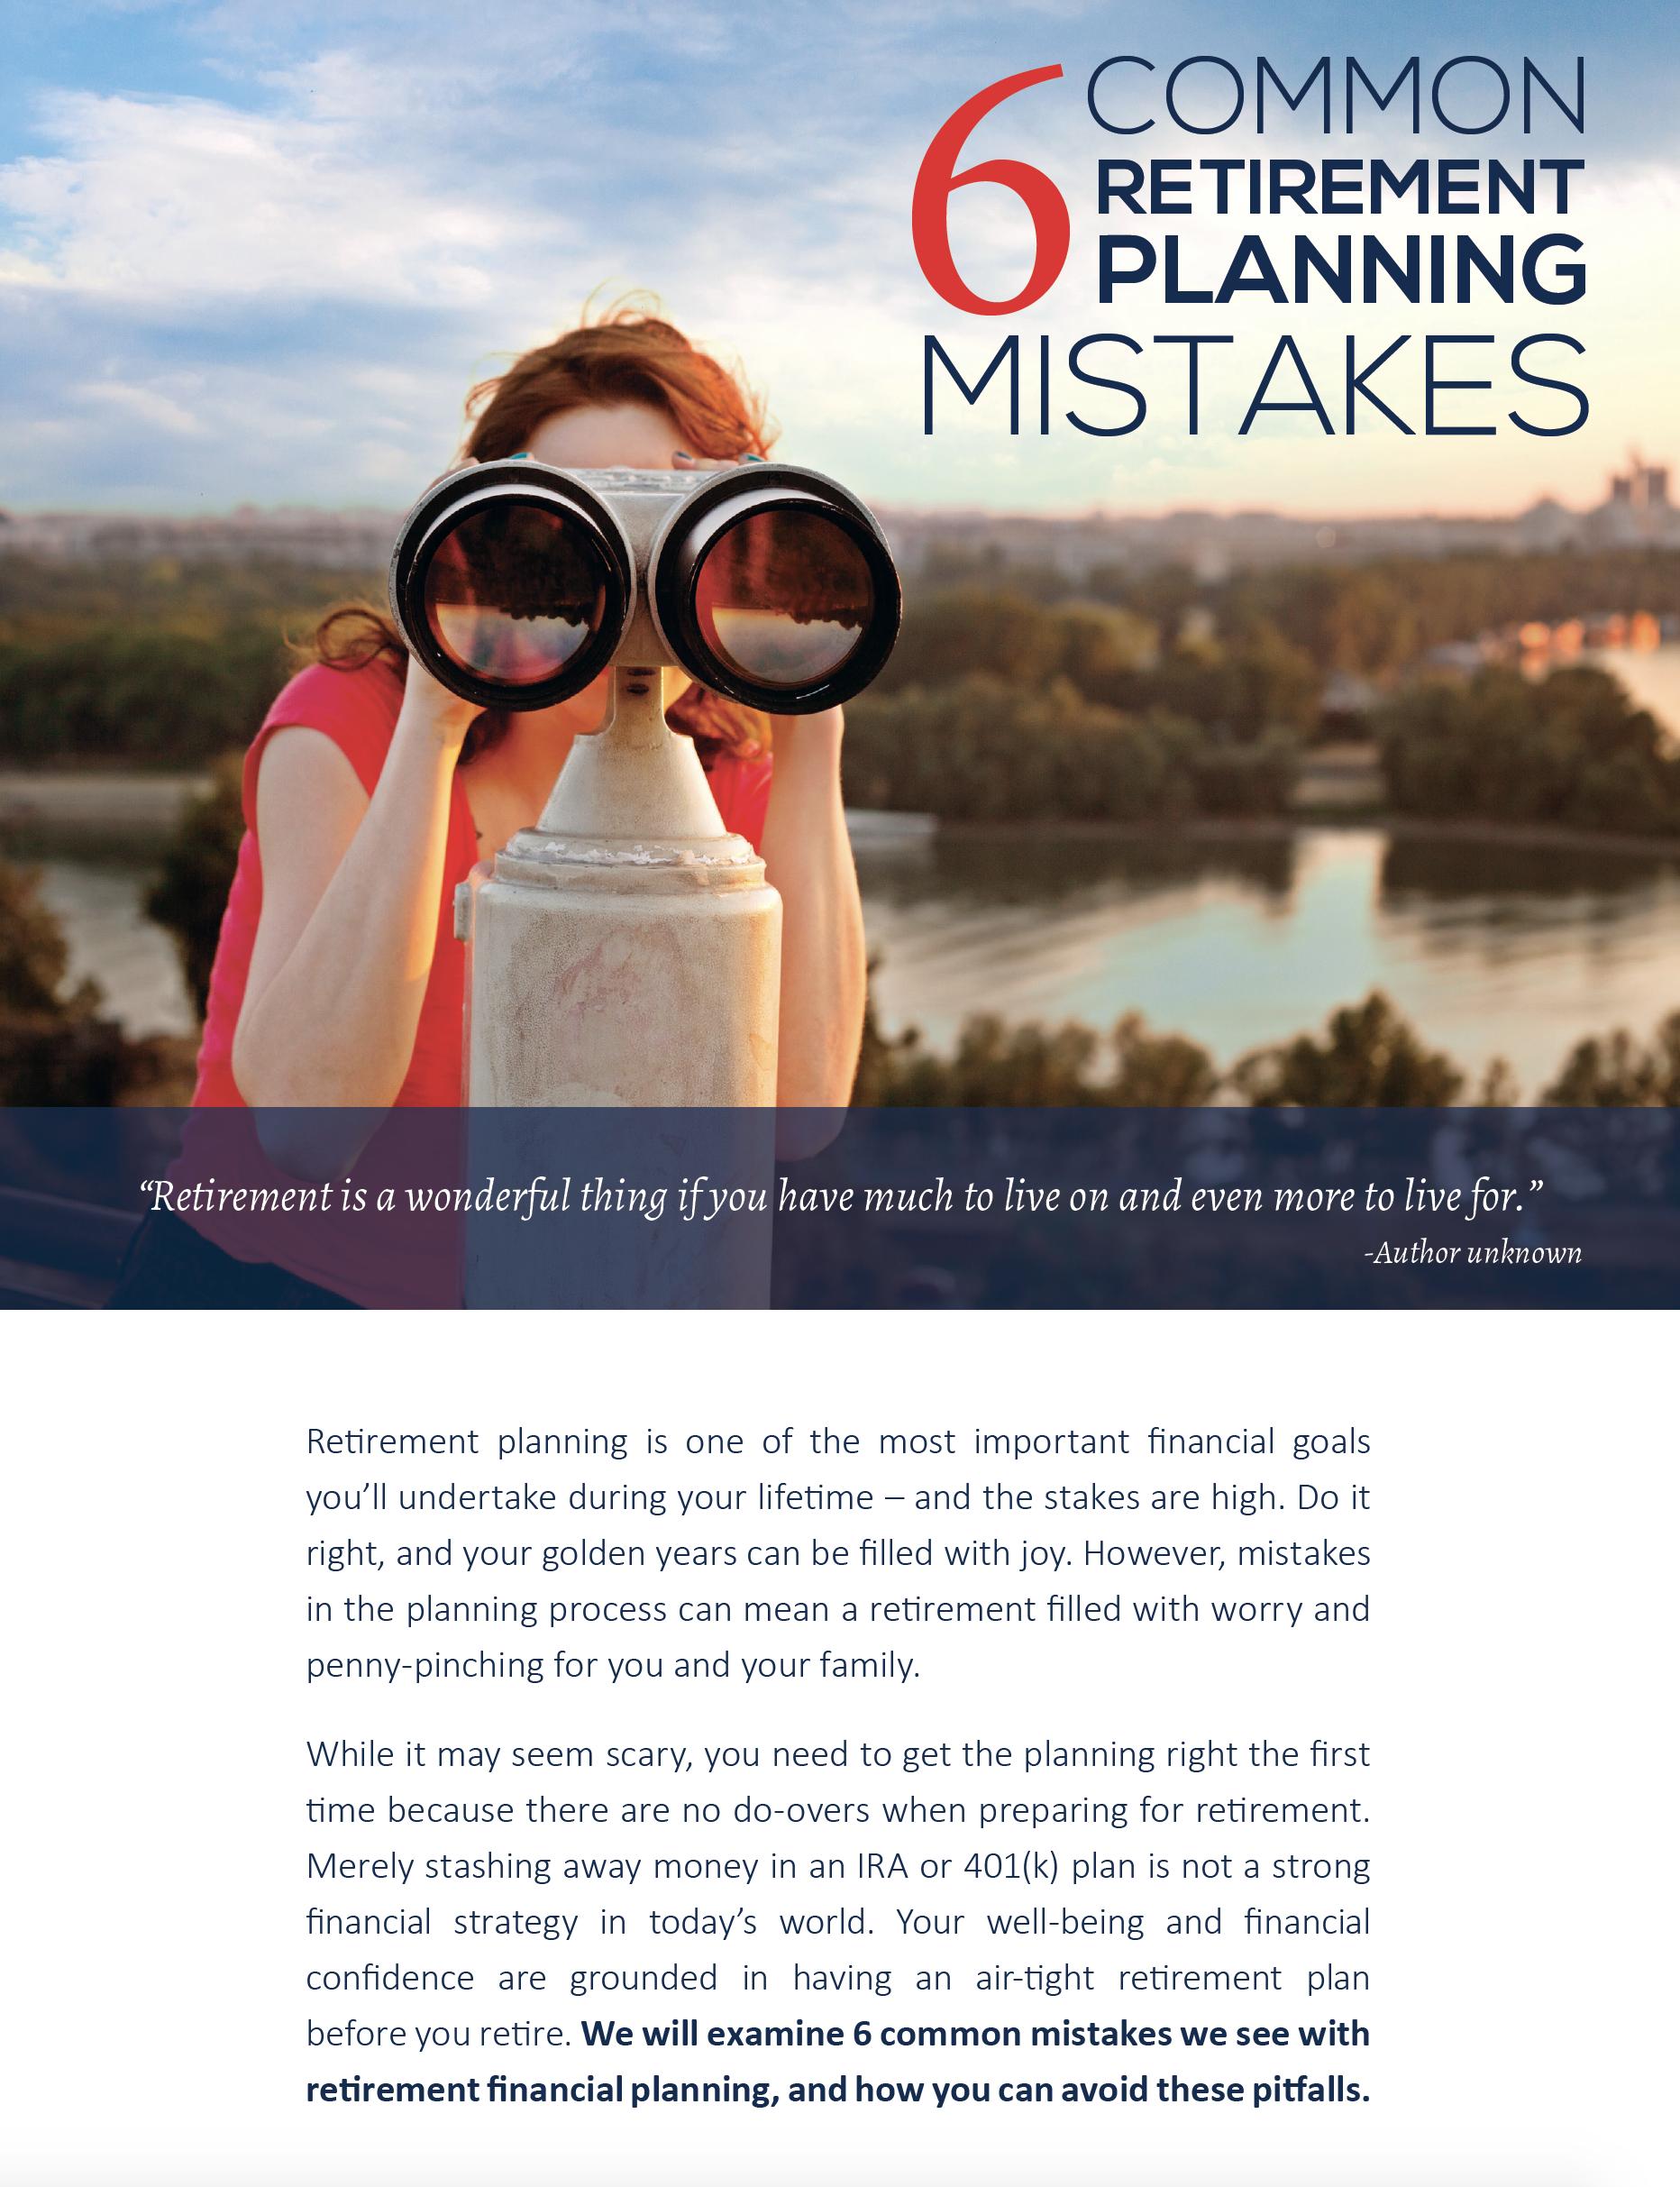 6 Common Retirement Planning Mistakes